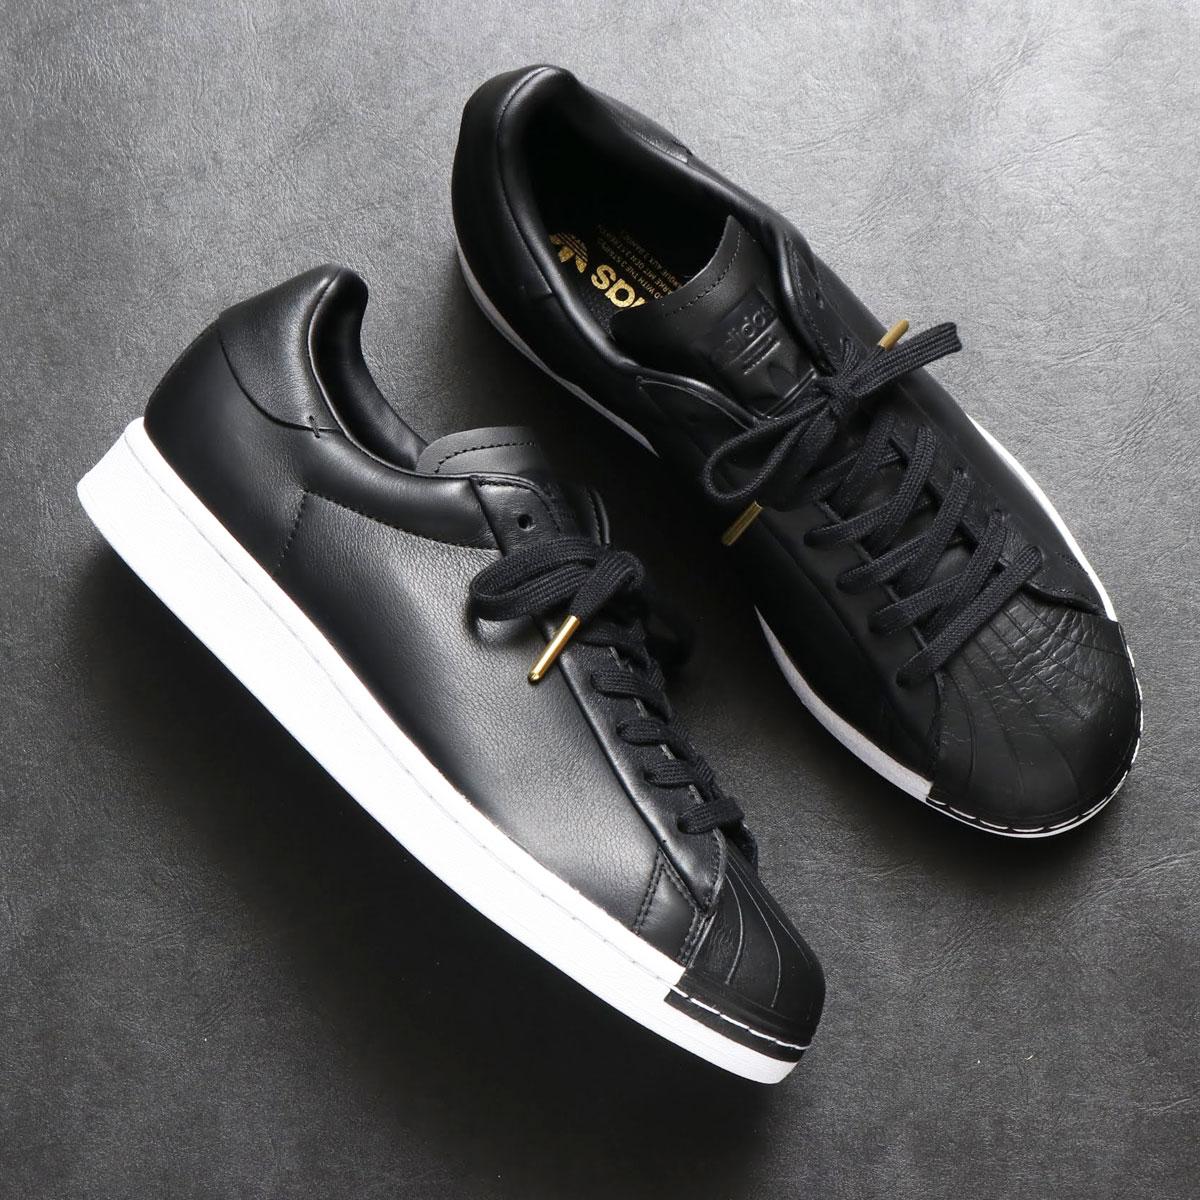 adidas SST PURE LT W(アディダス スーパースター ピュア LT W)CORE BLACK/FOOTWEAR WHITE/GOLD METARIC【レディース スニーカー】20SS-S